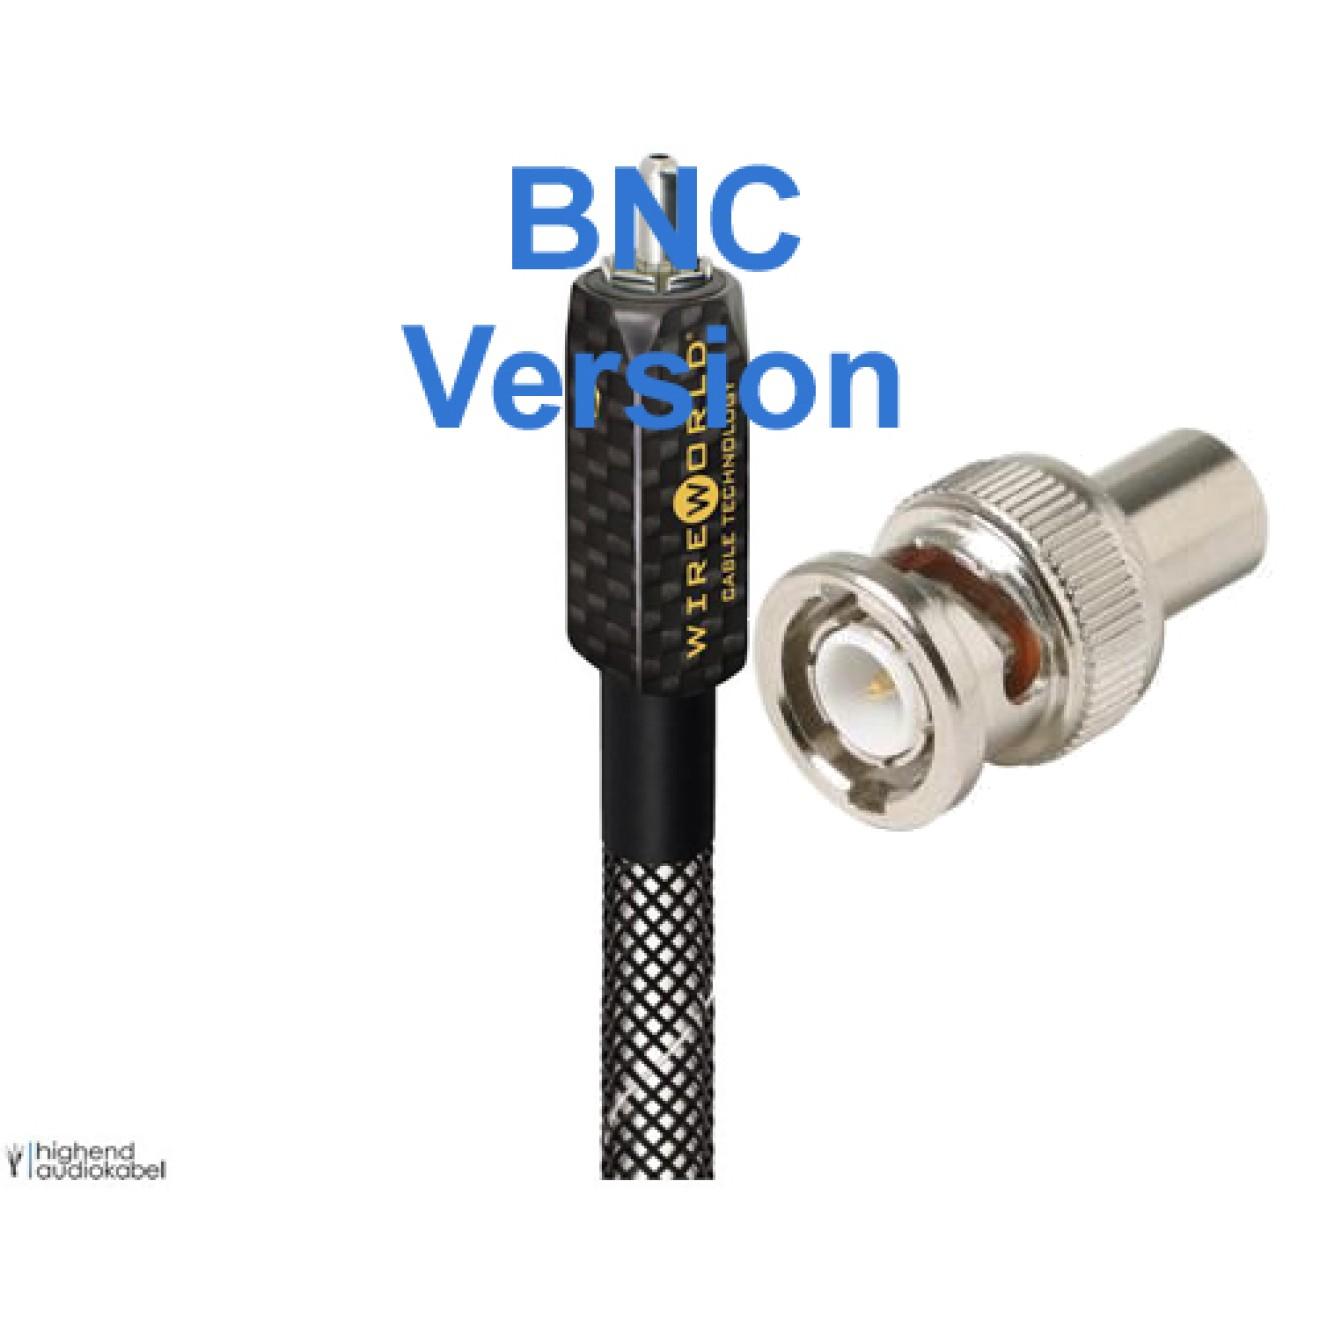 Wireworld Platinum Starlight 7 Digital BNC-Kabel, Highend-Audiokabel ...